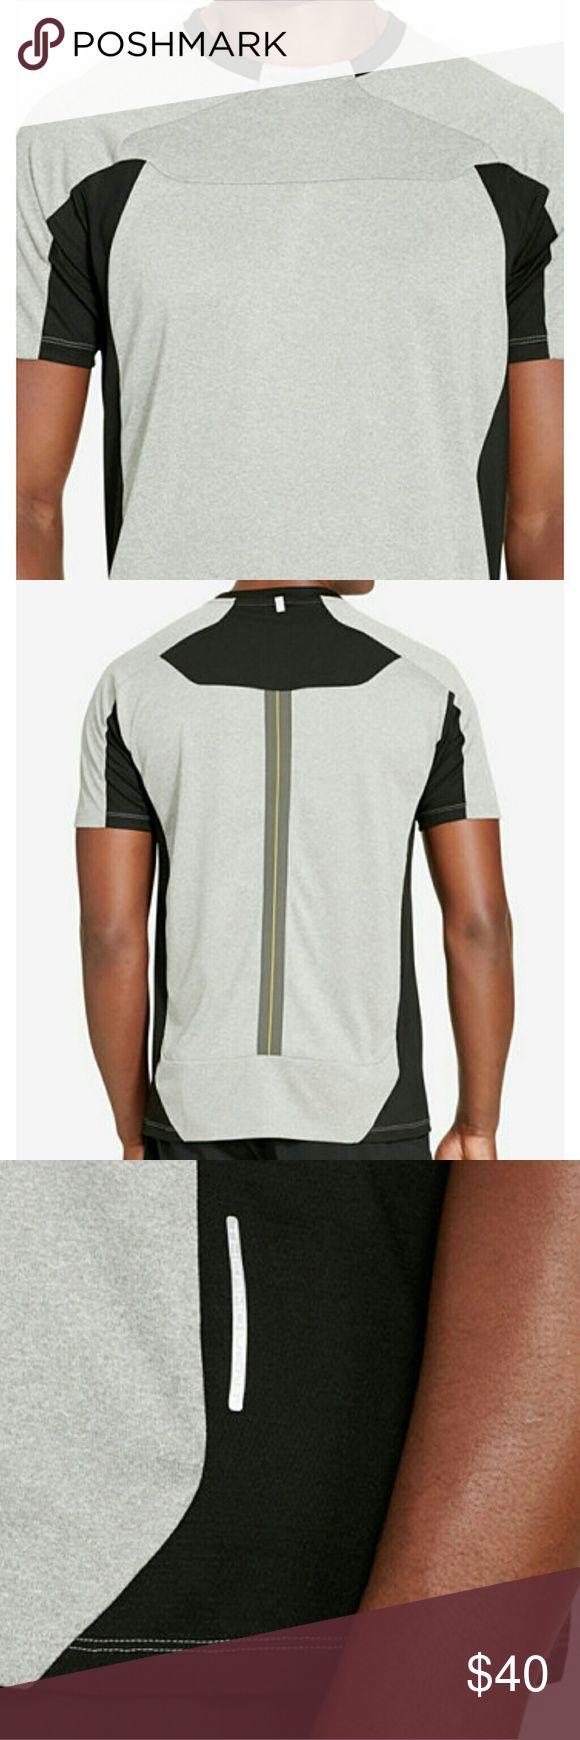 Polo Sport Ralph Lauren Polo Sport Ralph Lauren Polo by Ralph Lauren Shirts Tees - Short Sleeve